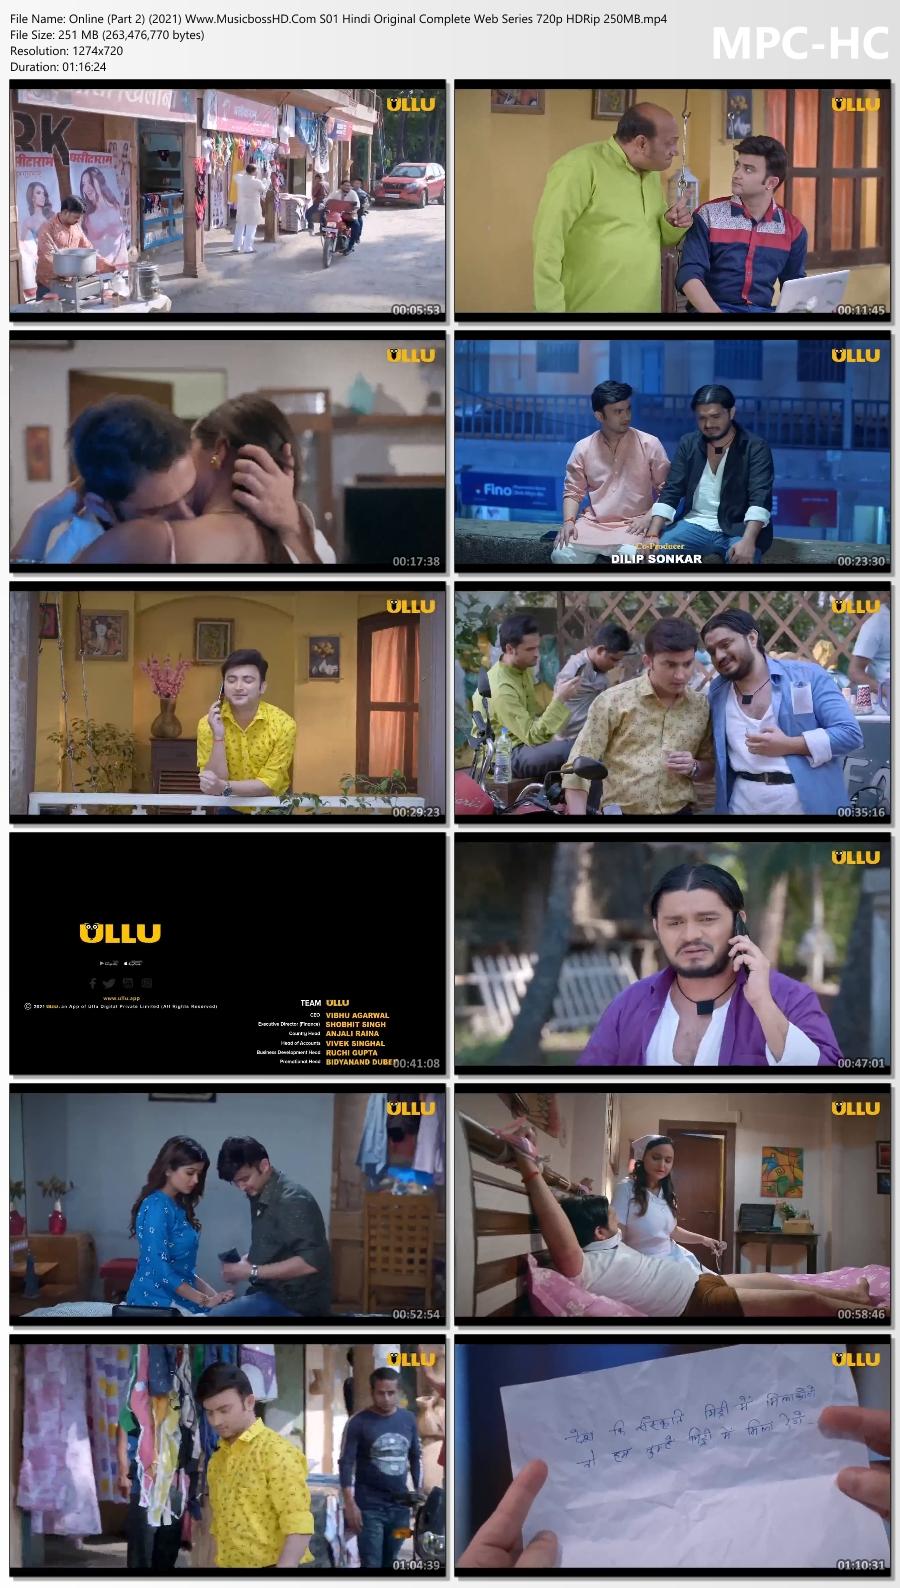 Online-Part-2-2021-Www-Musicboss-HD-Com-S01-Hindi-Original-Complete-Web-Series-720p-HDRip-250-MB-mp4